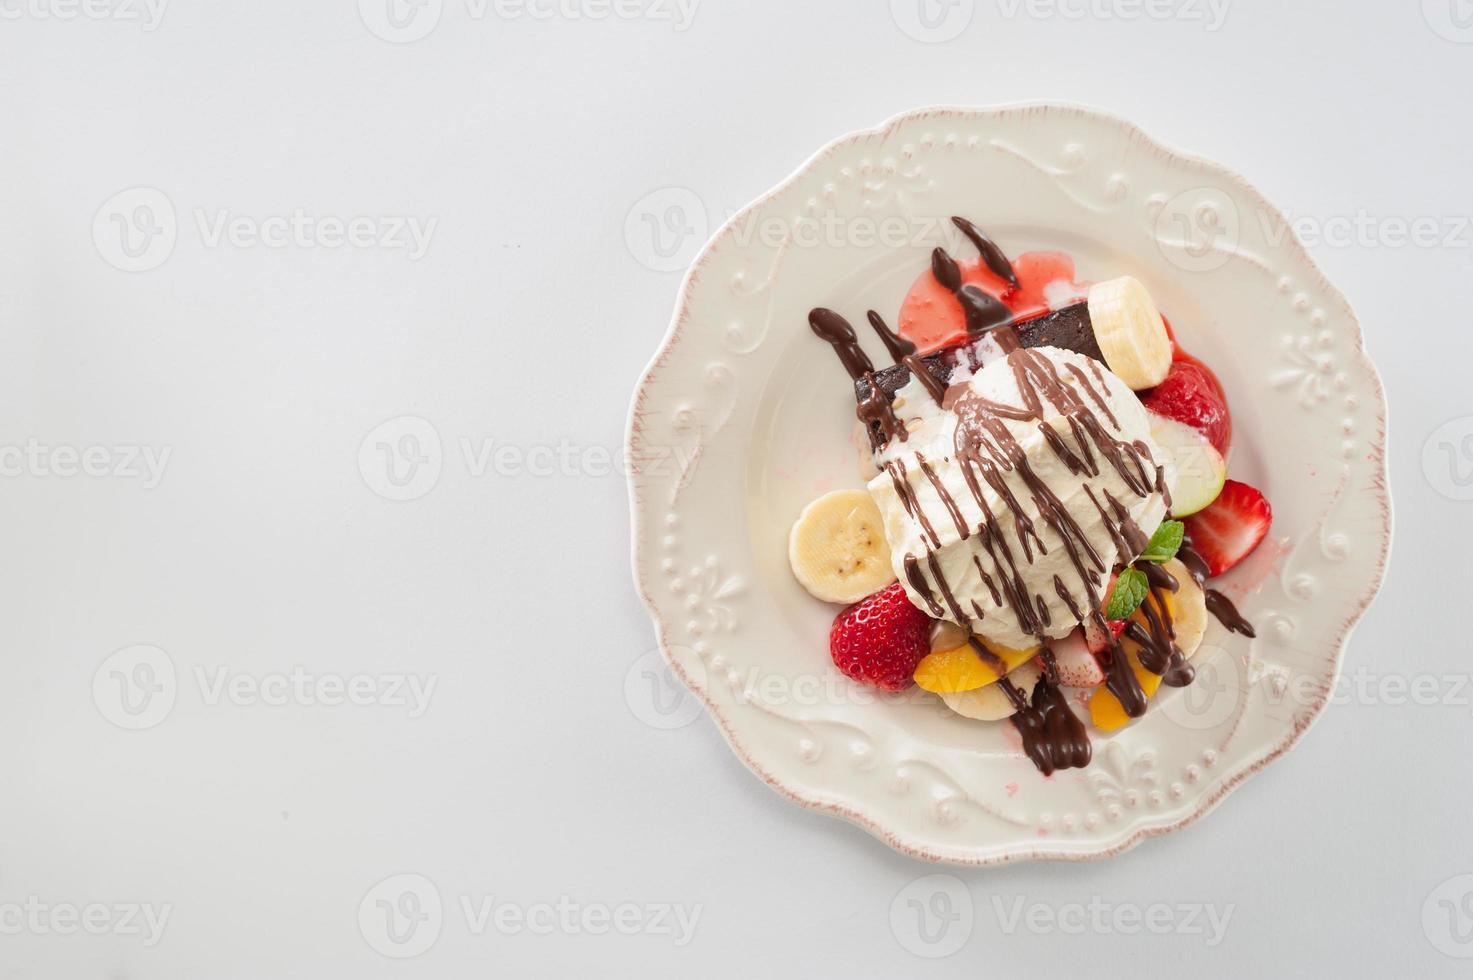 gelato foto